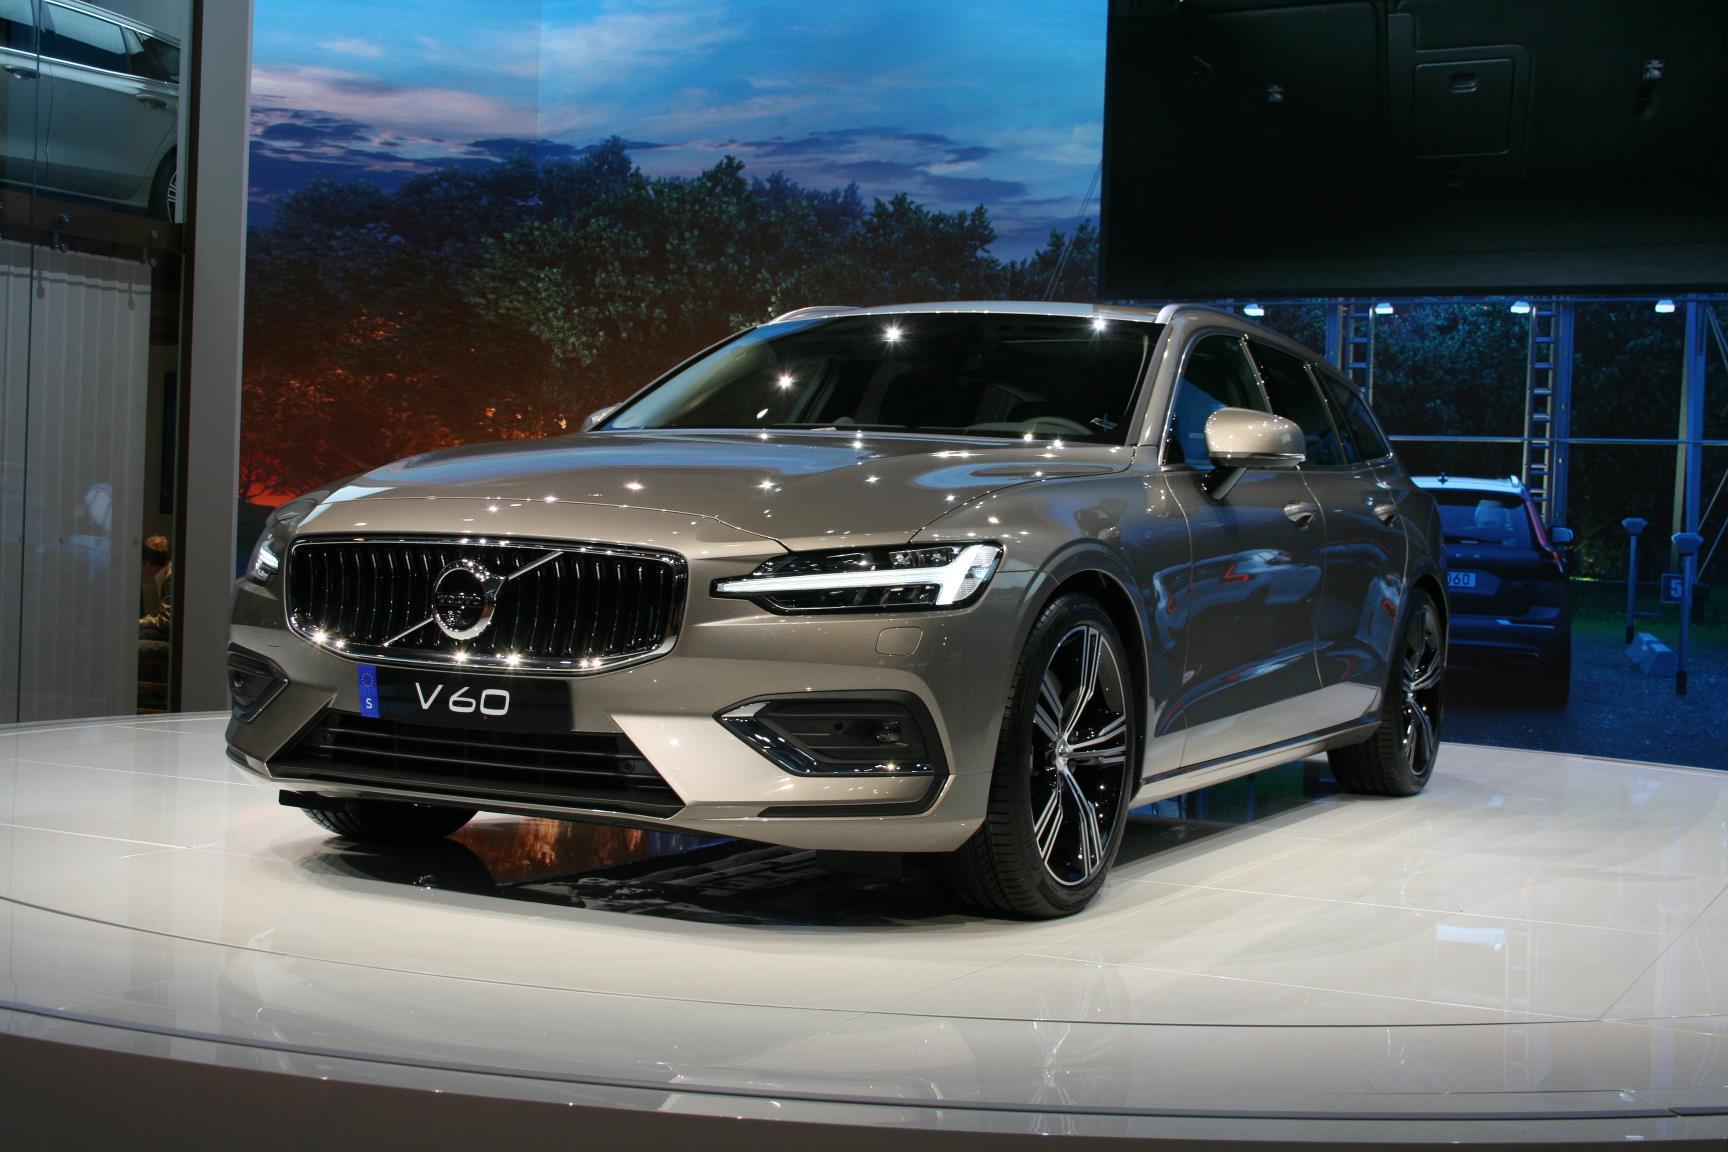 Geneva Motor Show 2018 Mega Gallery Part 1 (152)